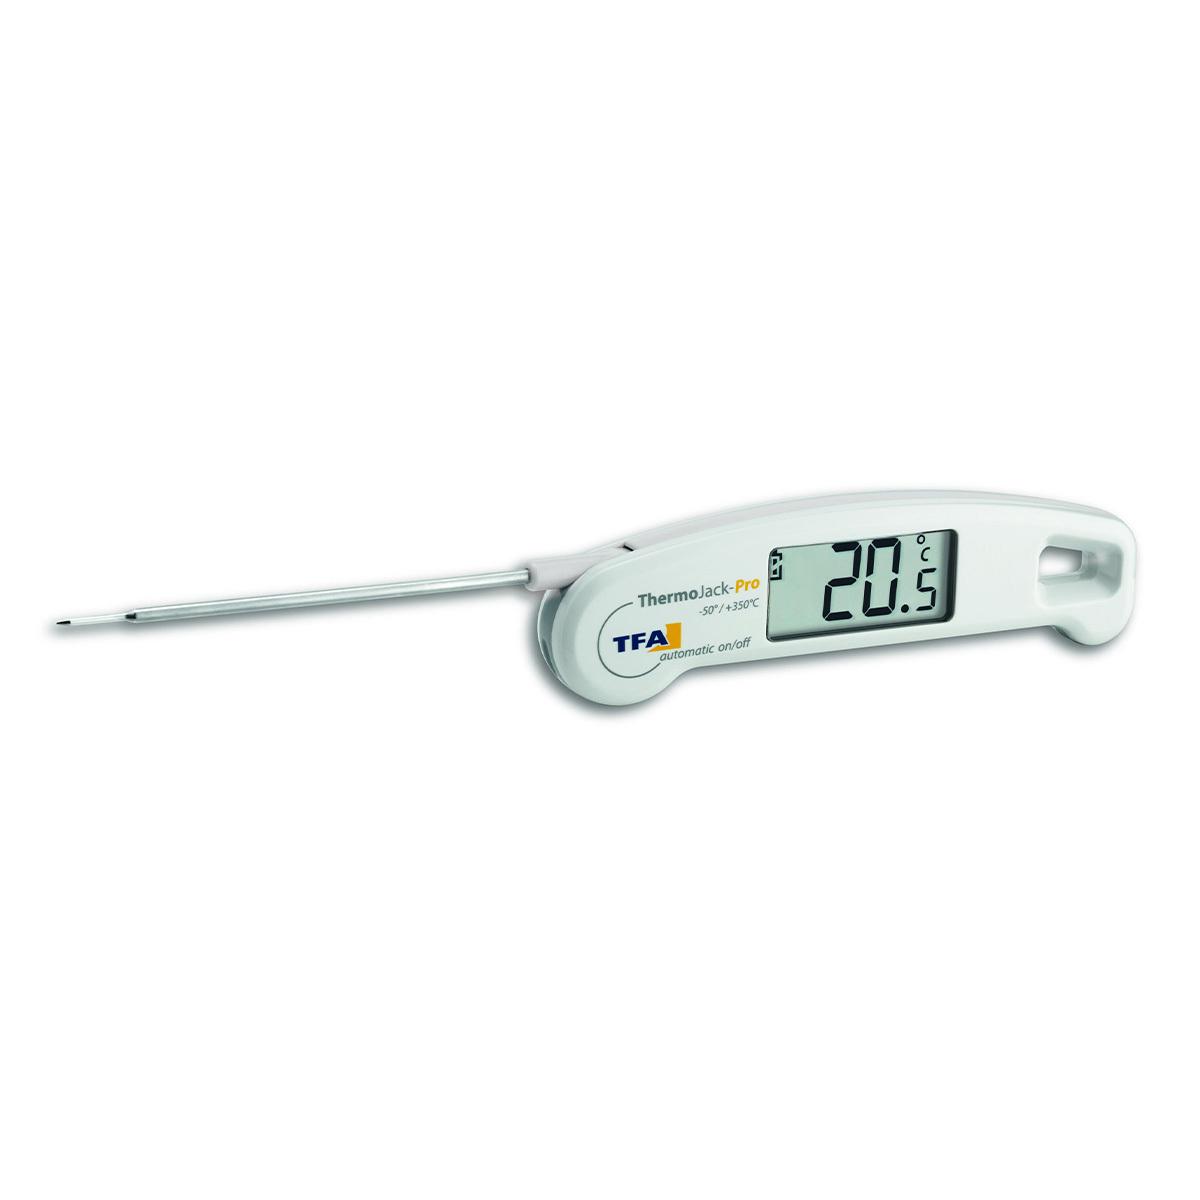 30-1050-02-digitales-einstich-thermometer-themo-jack-pro-1200x1200px.jpg